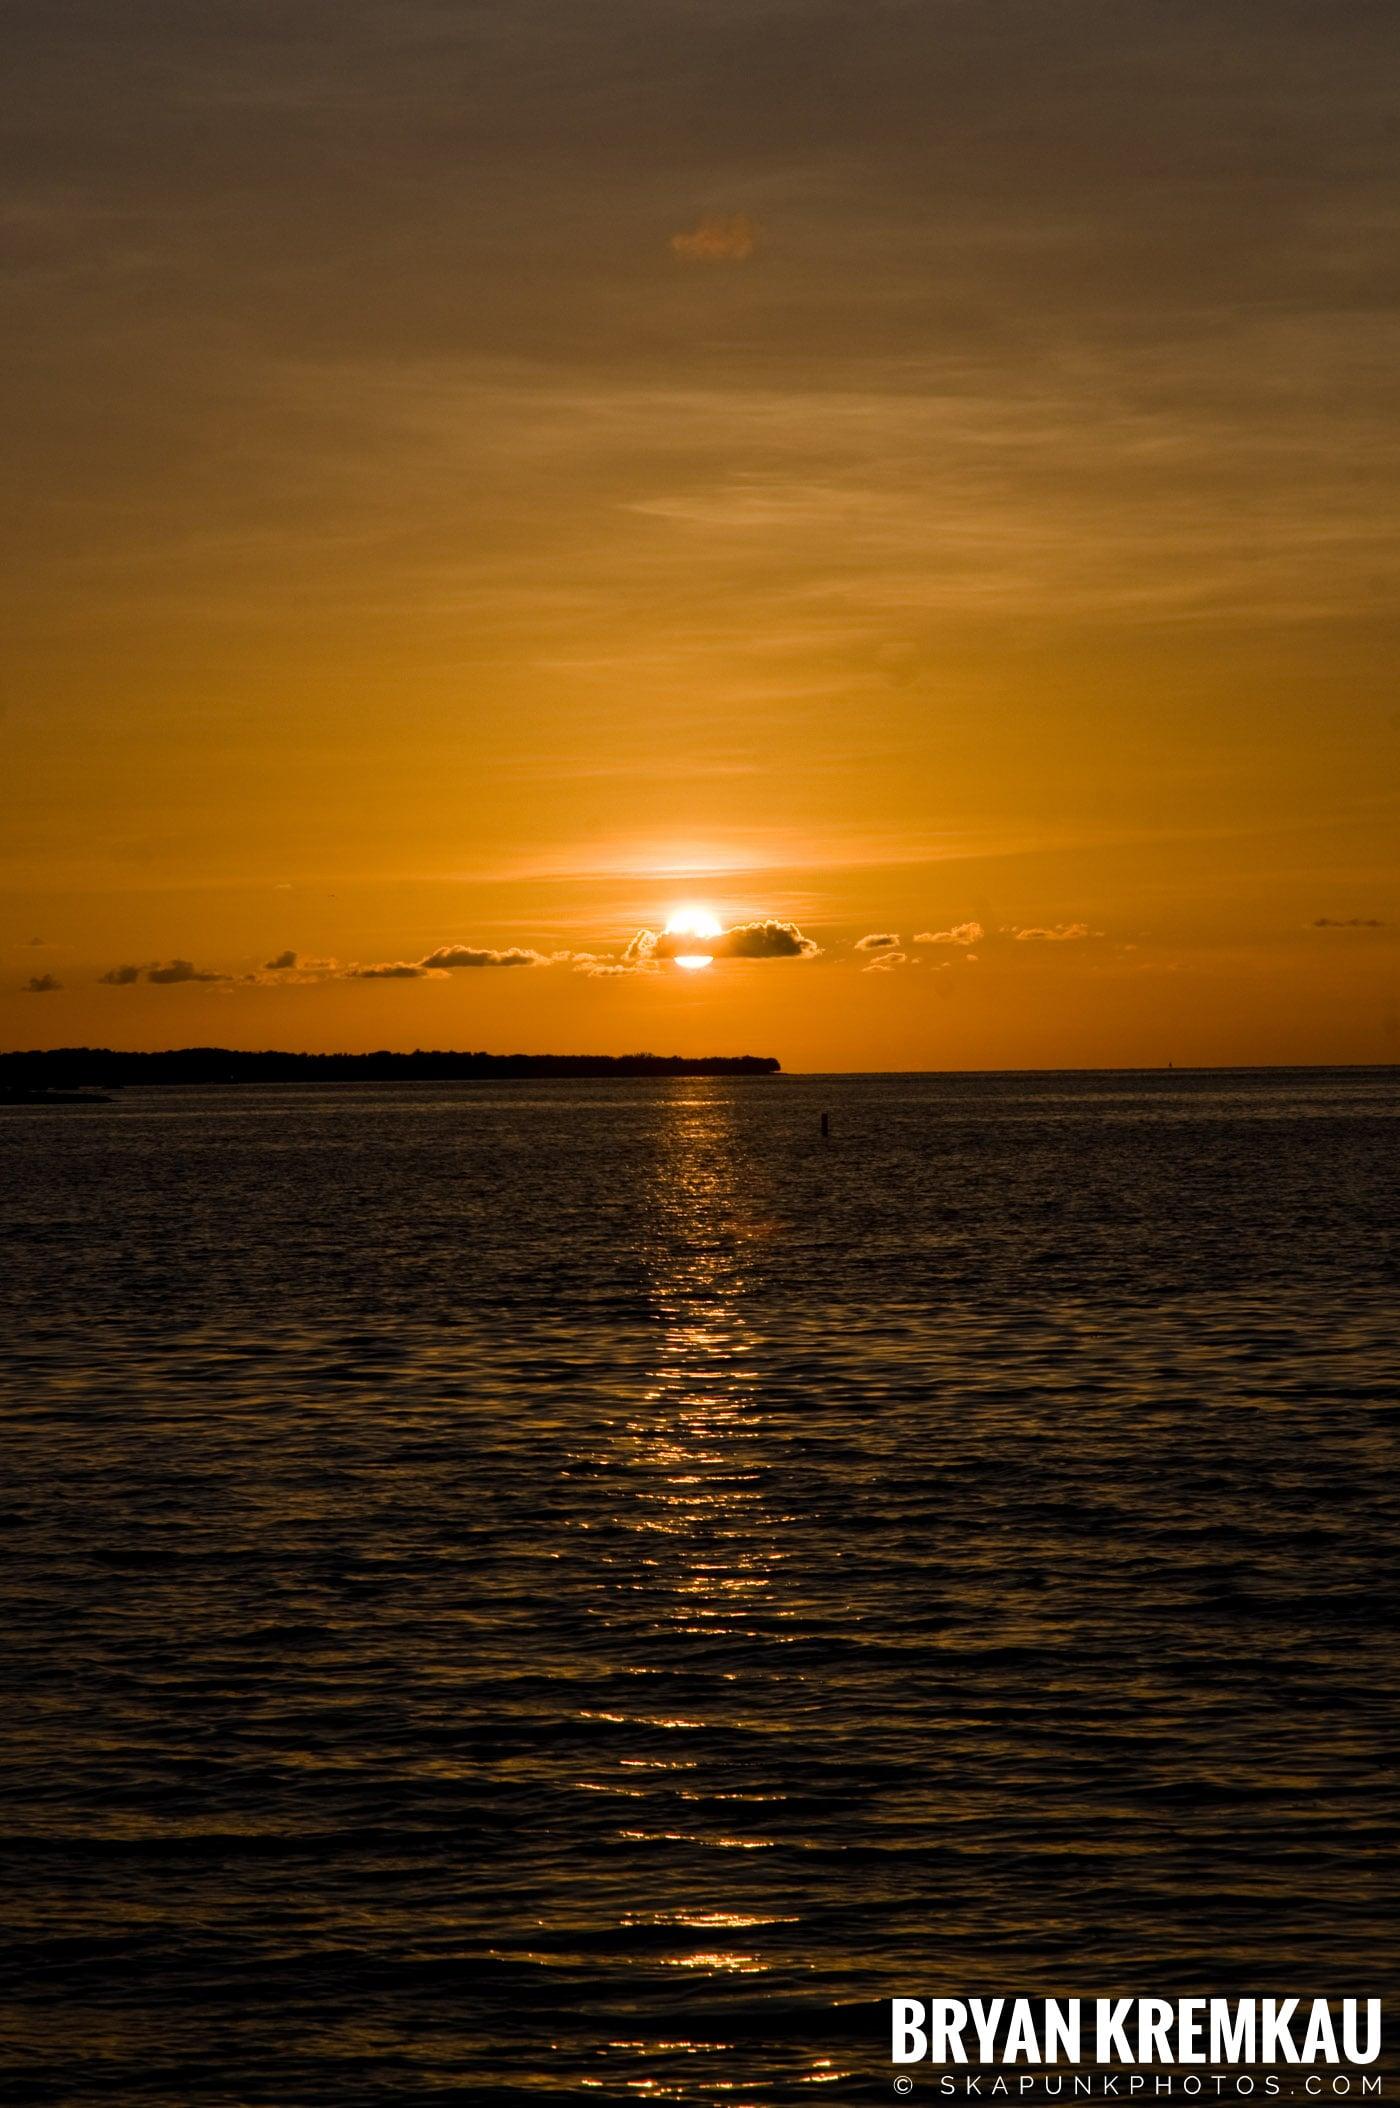 Florida Keys Vacation - 7.09.10 - 7.15.10 (55)